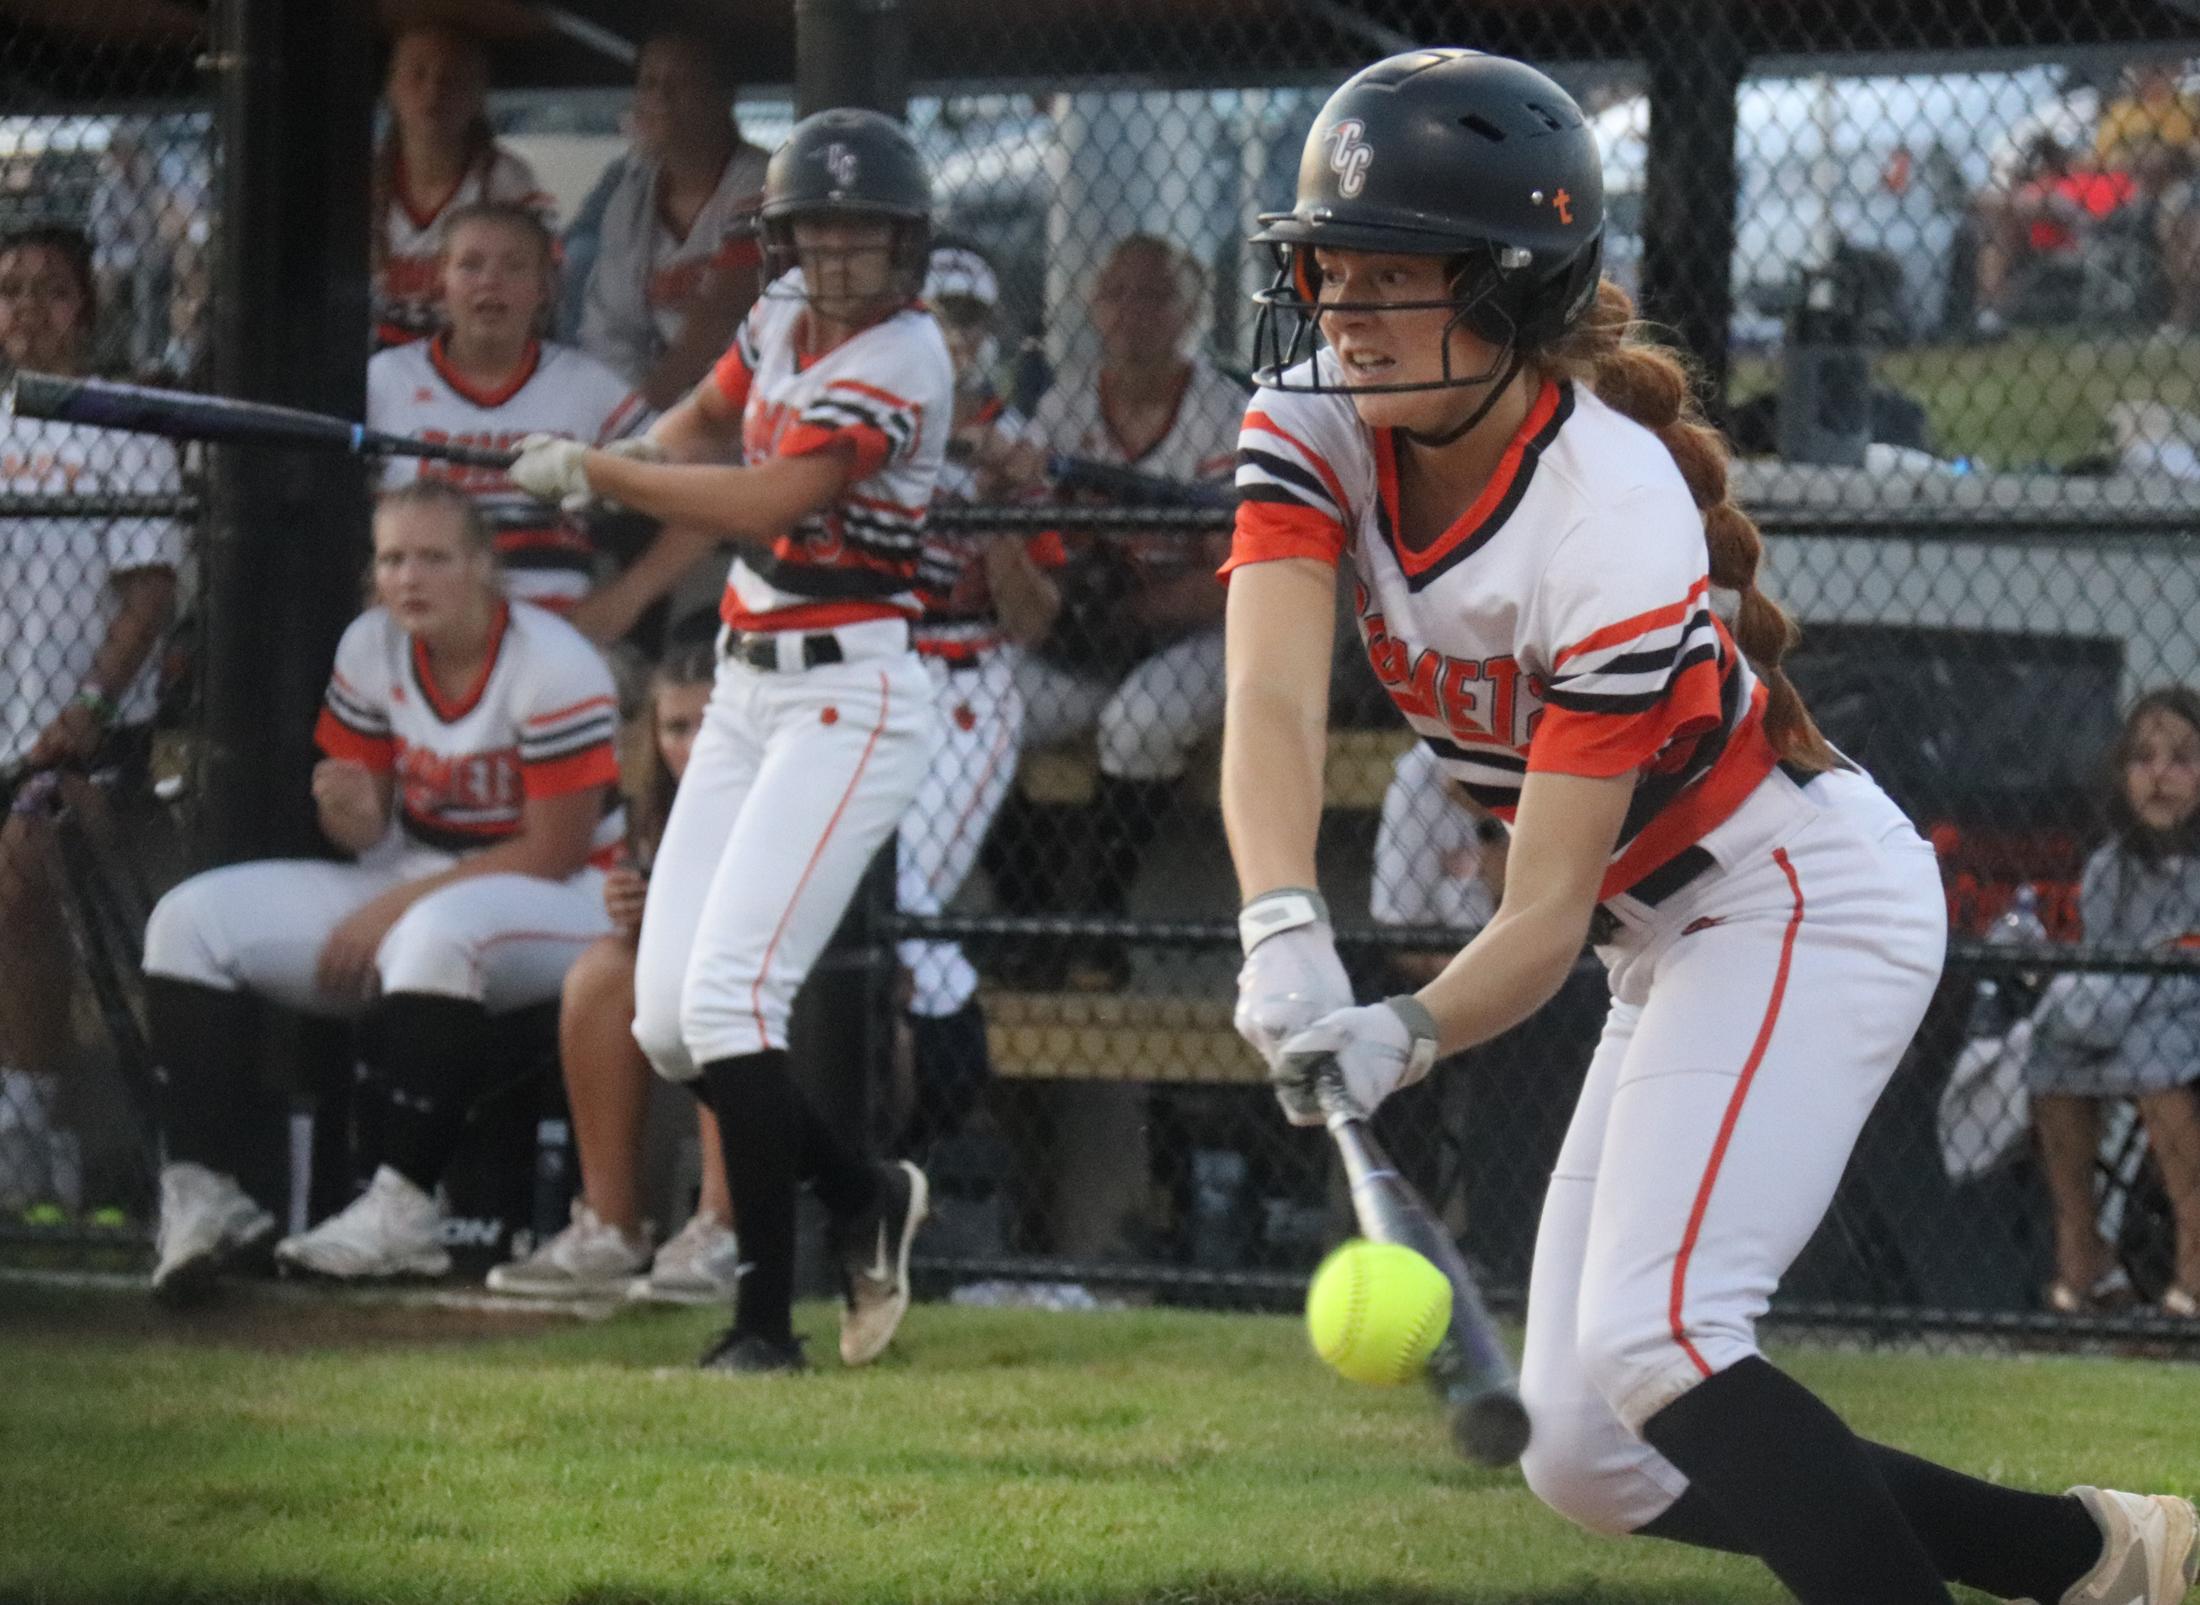 Comets named to All-NEIC Baseball and Softball Teams